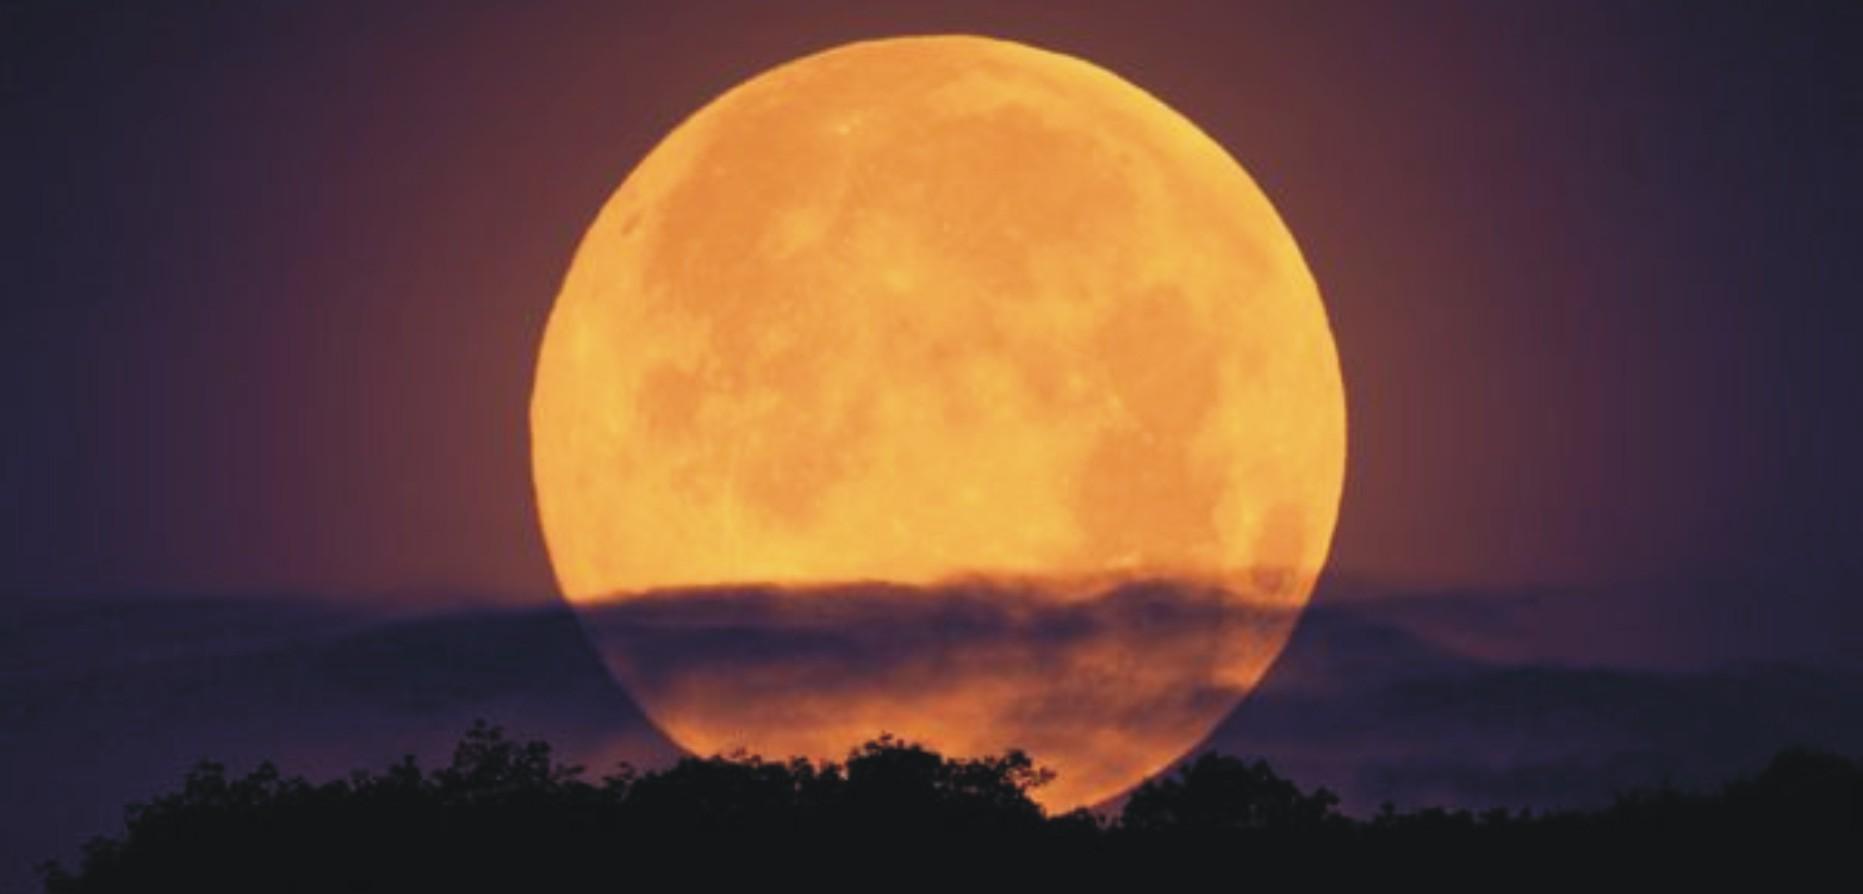 Superluna del 28 settembre